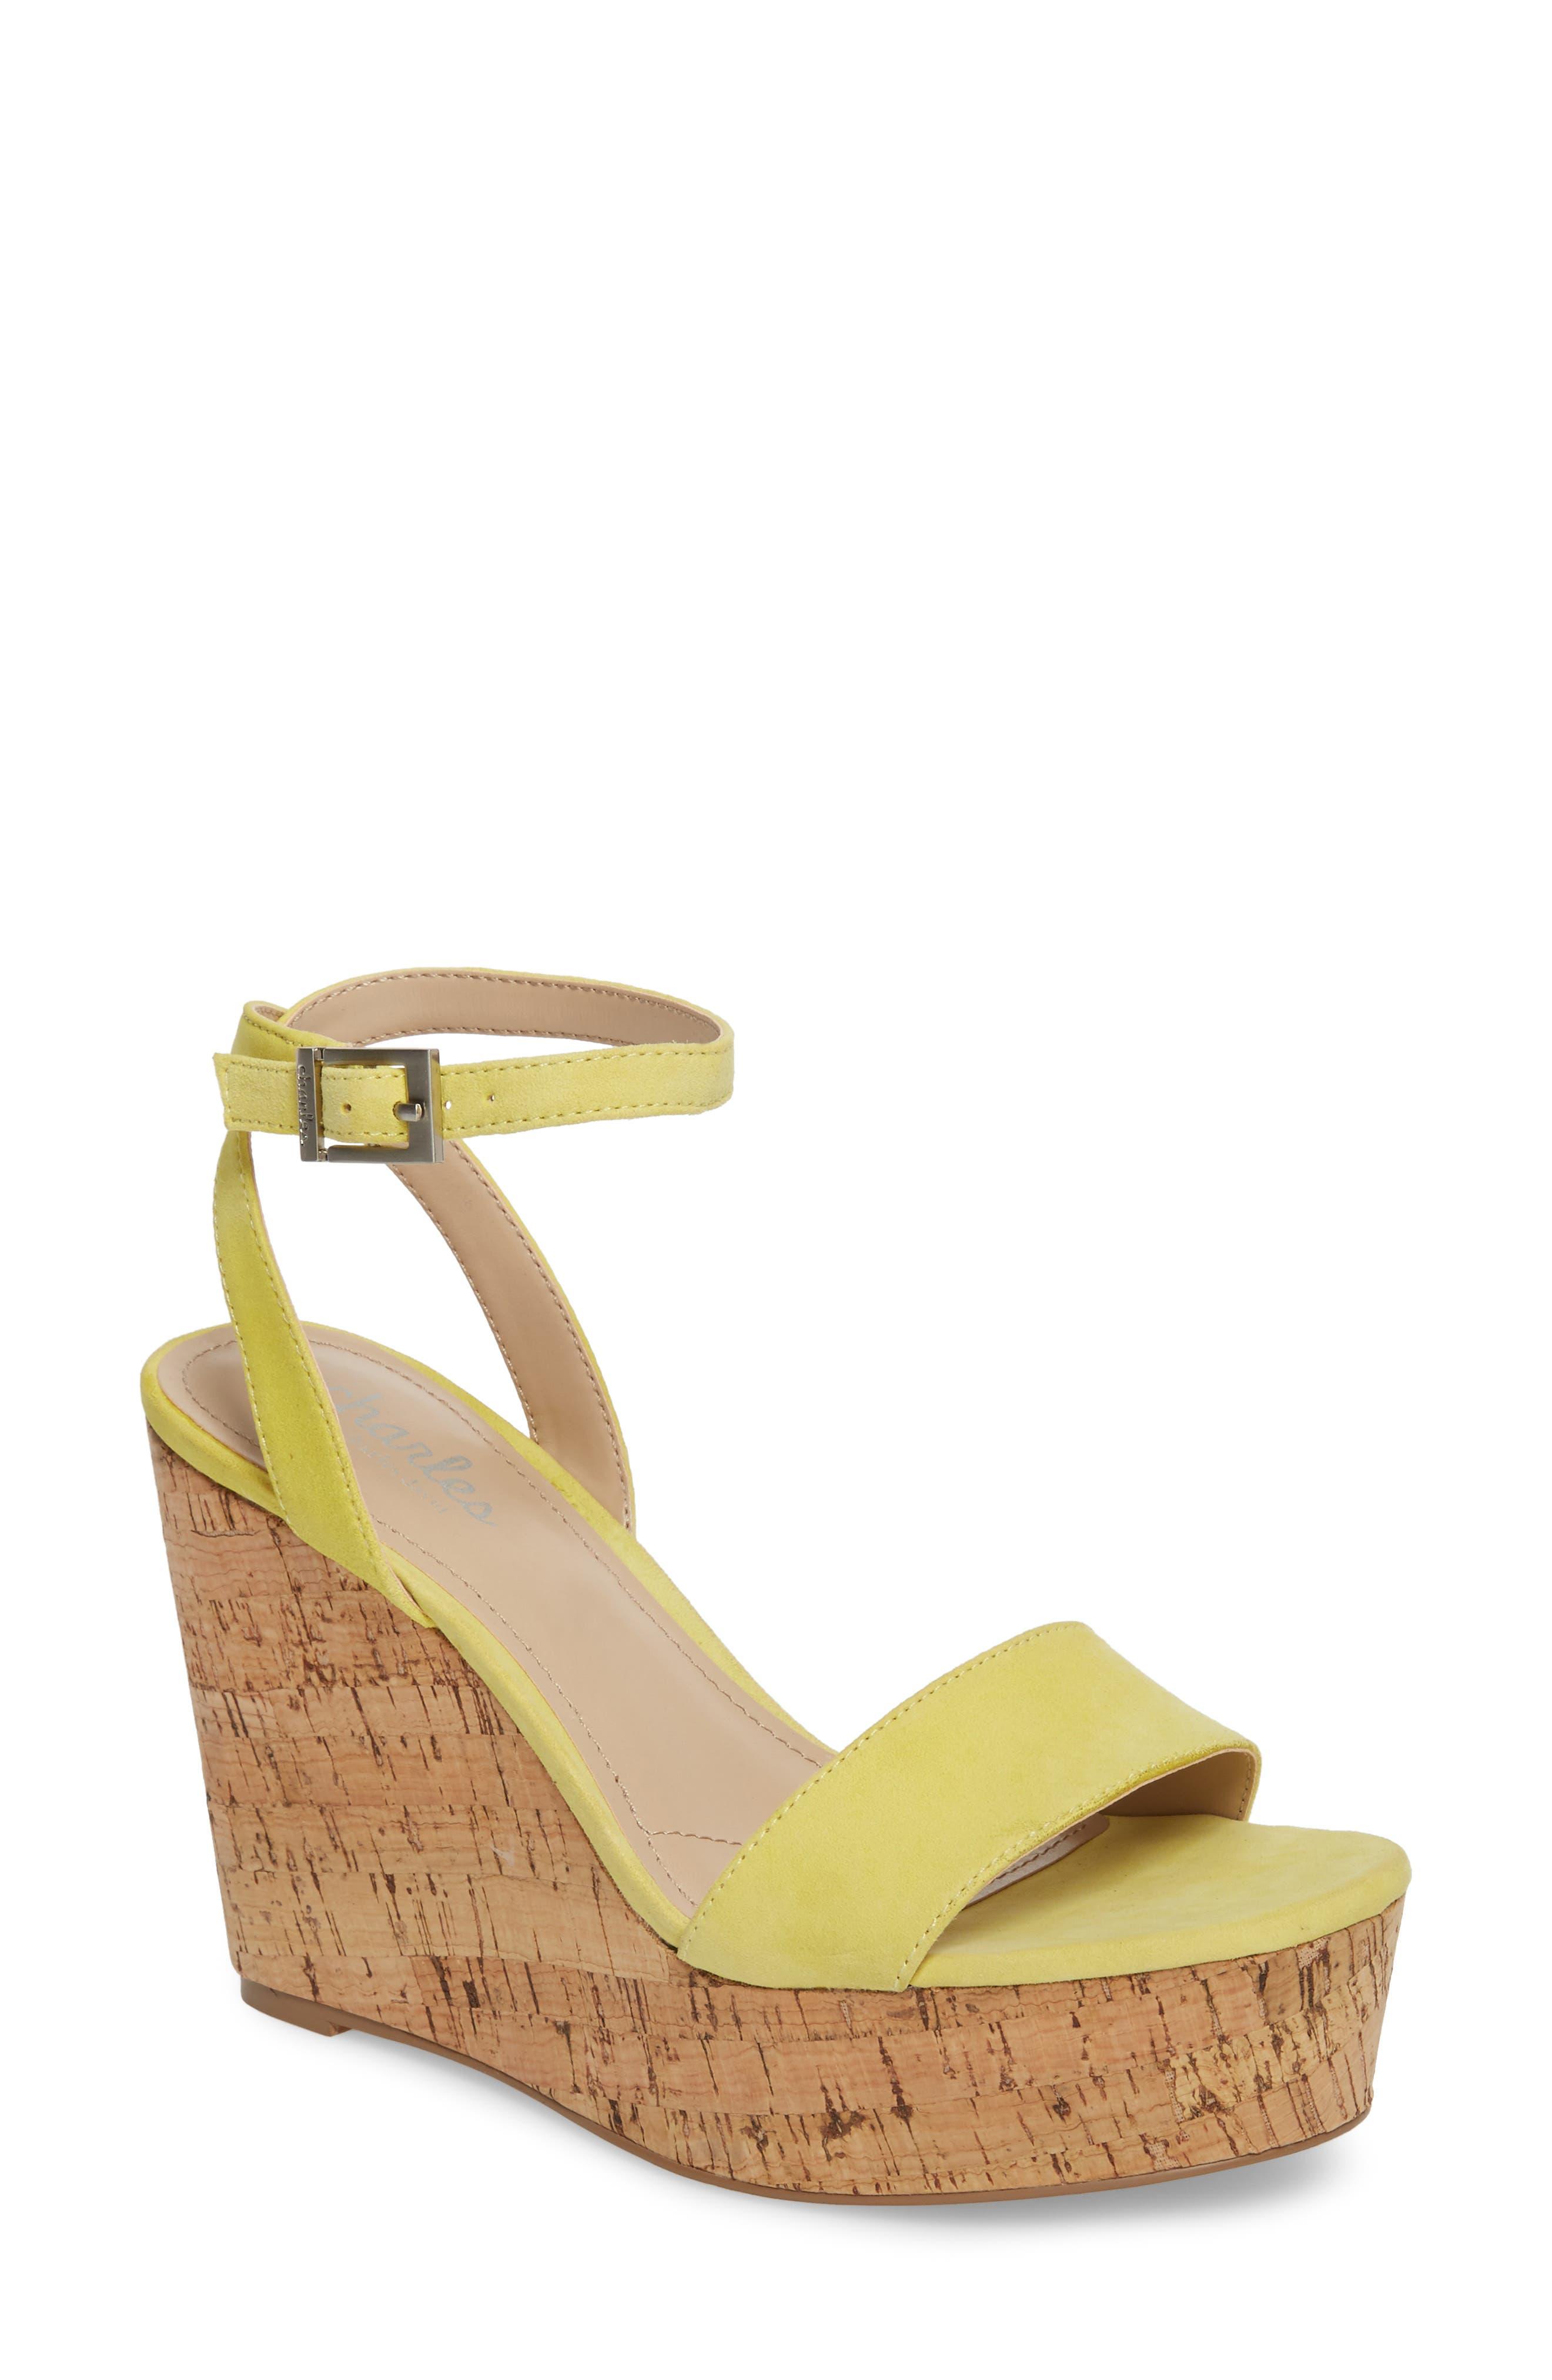 Lilla Platform Wedge Sandal,                             Main thumbnail 1, color,                             Yellow Suede